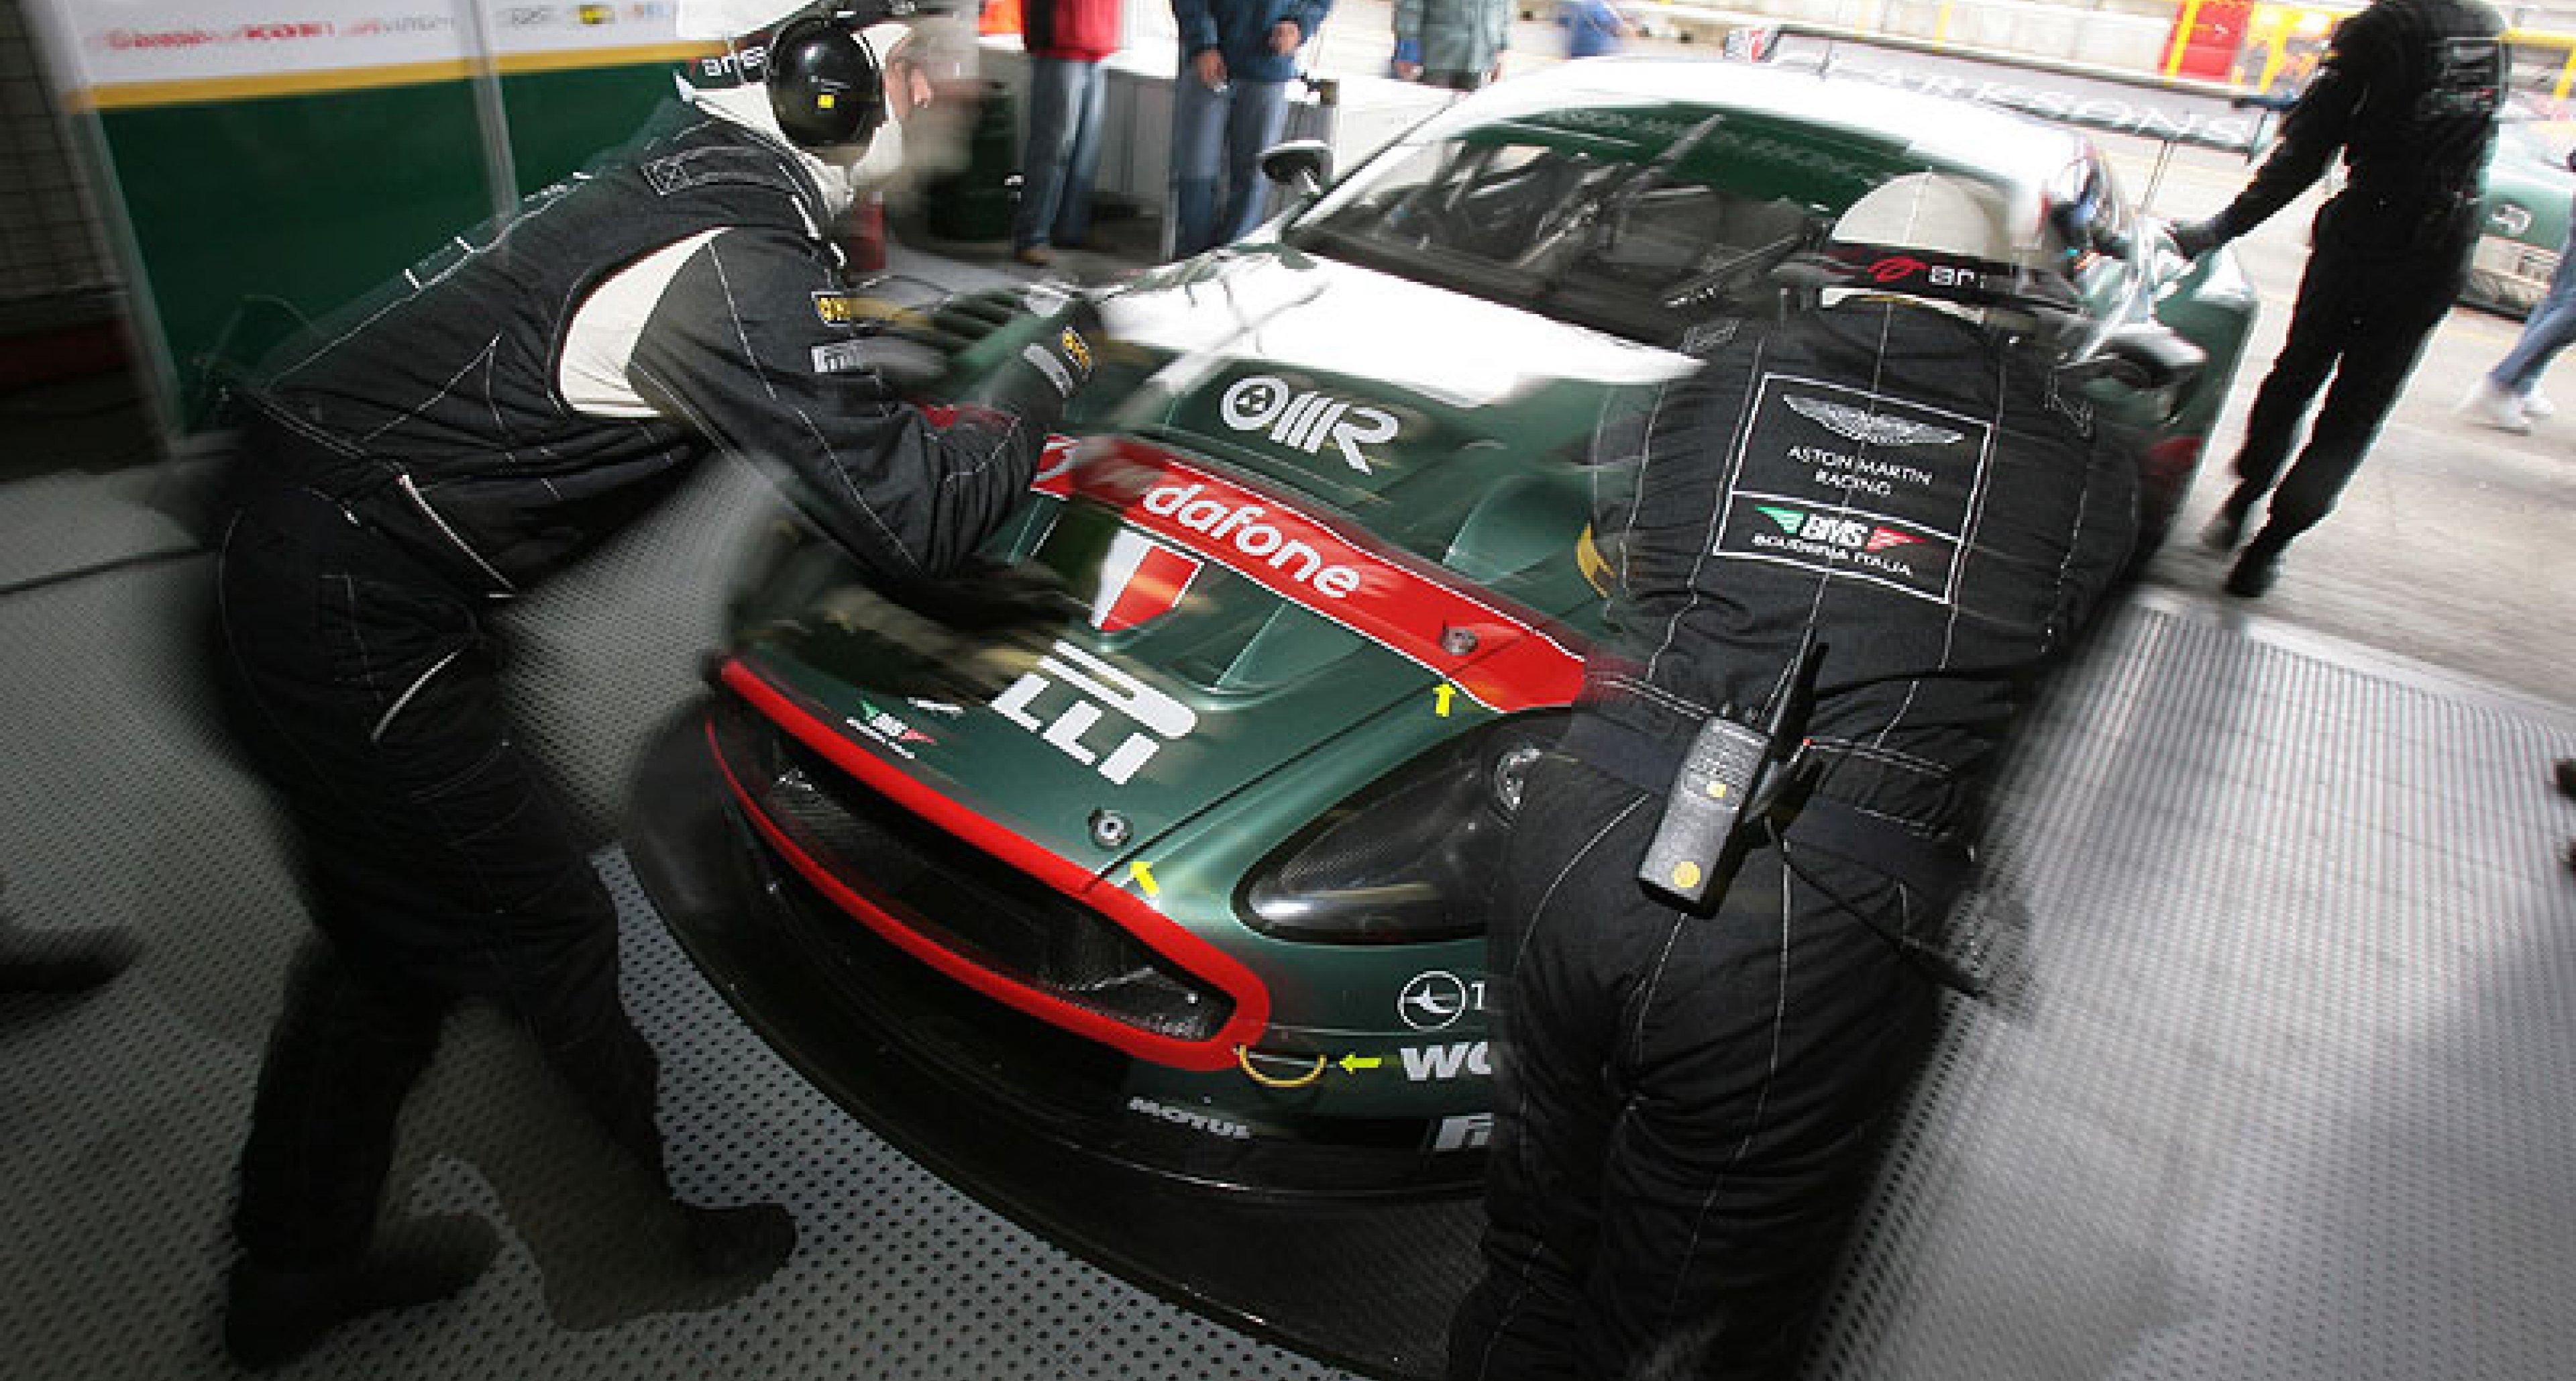 FIA GT at Brno 2006